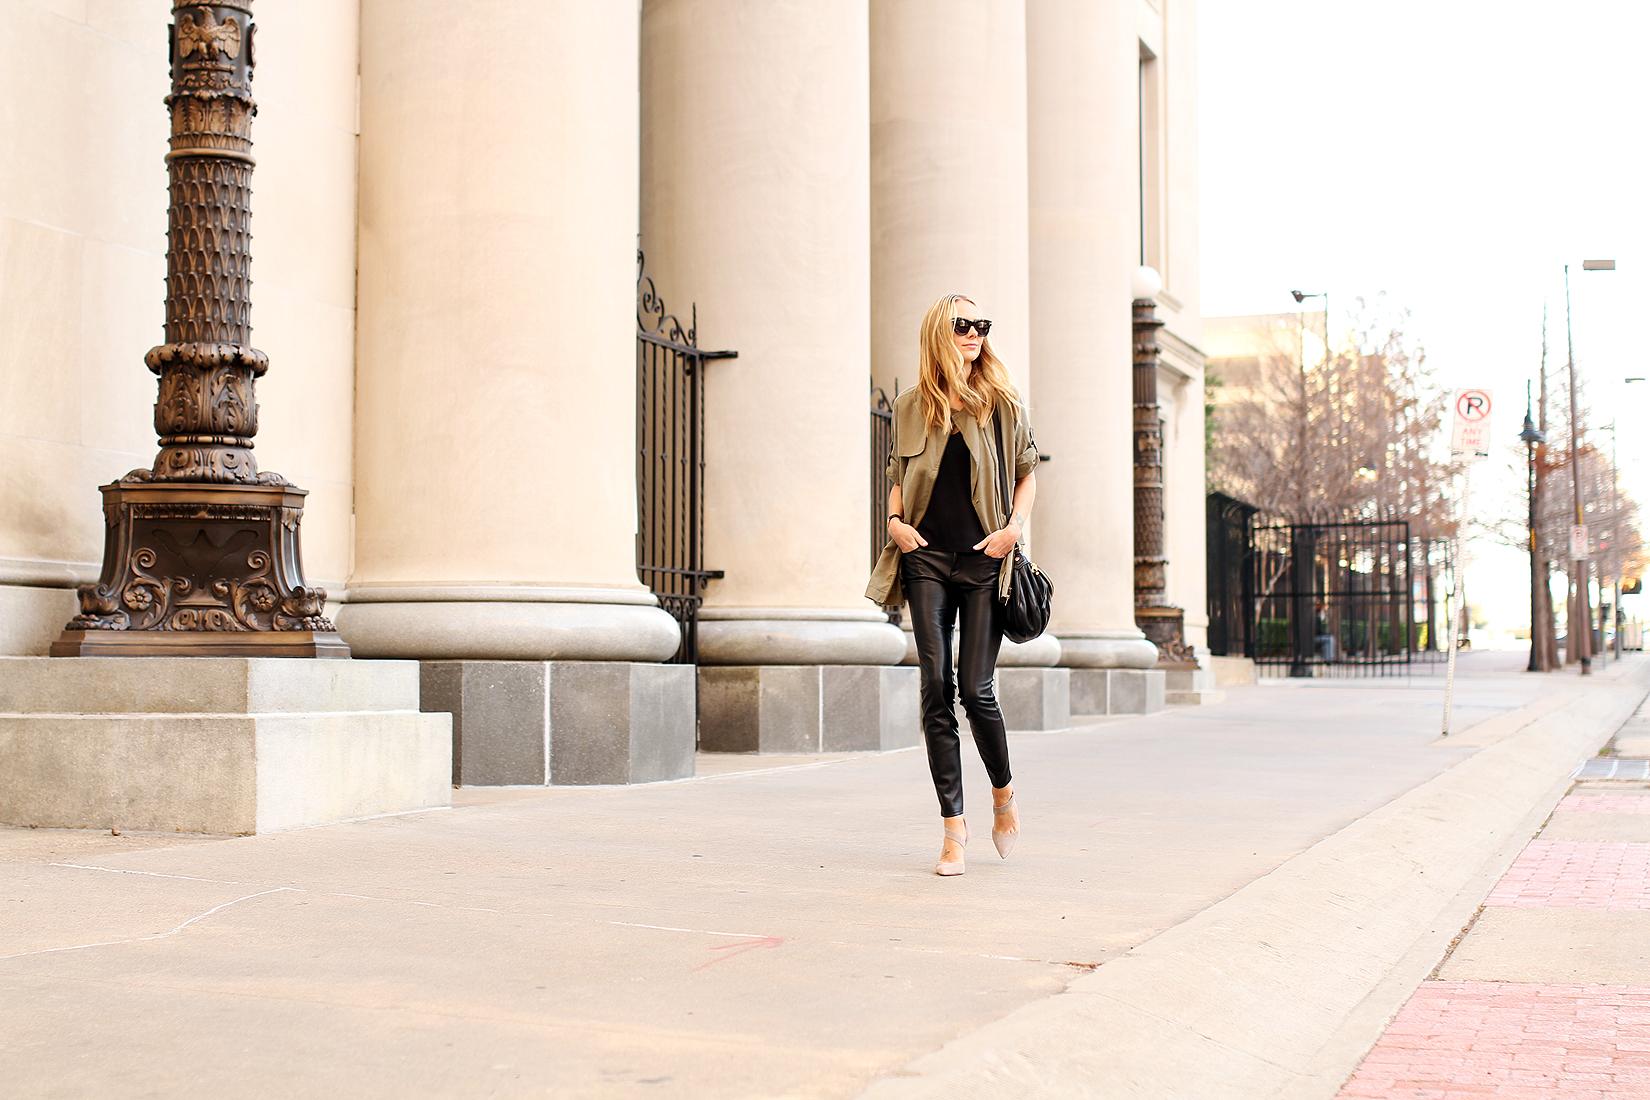 fashion-jackson-banana-republic-drapey-drawstring-jacket-black-faux-leather-pants-vince-camuto-carlotte-pumps-celine-sunglasses